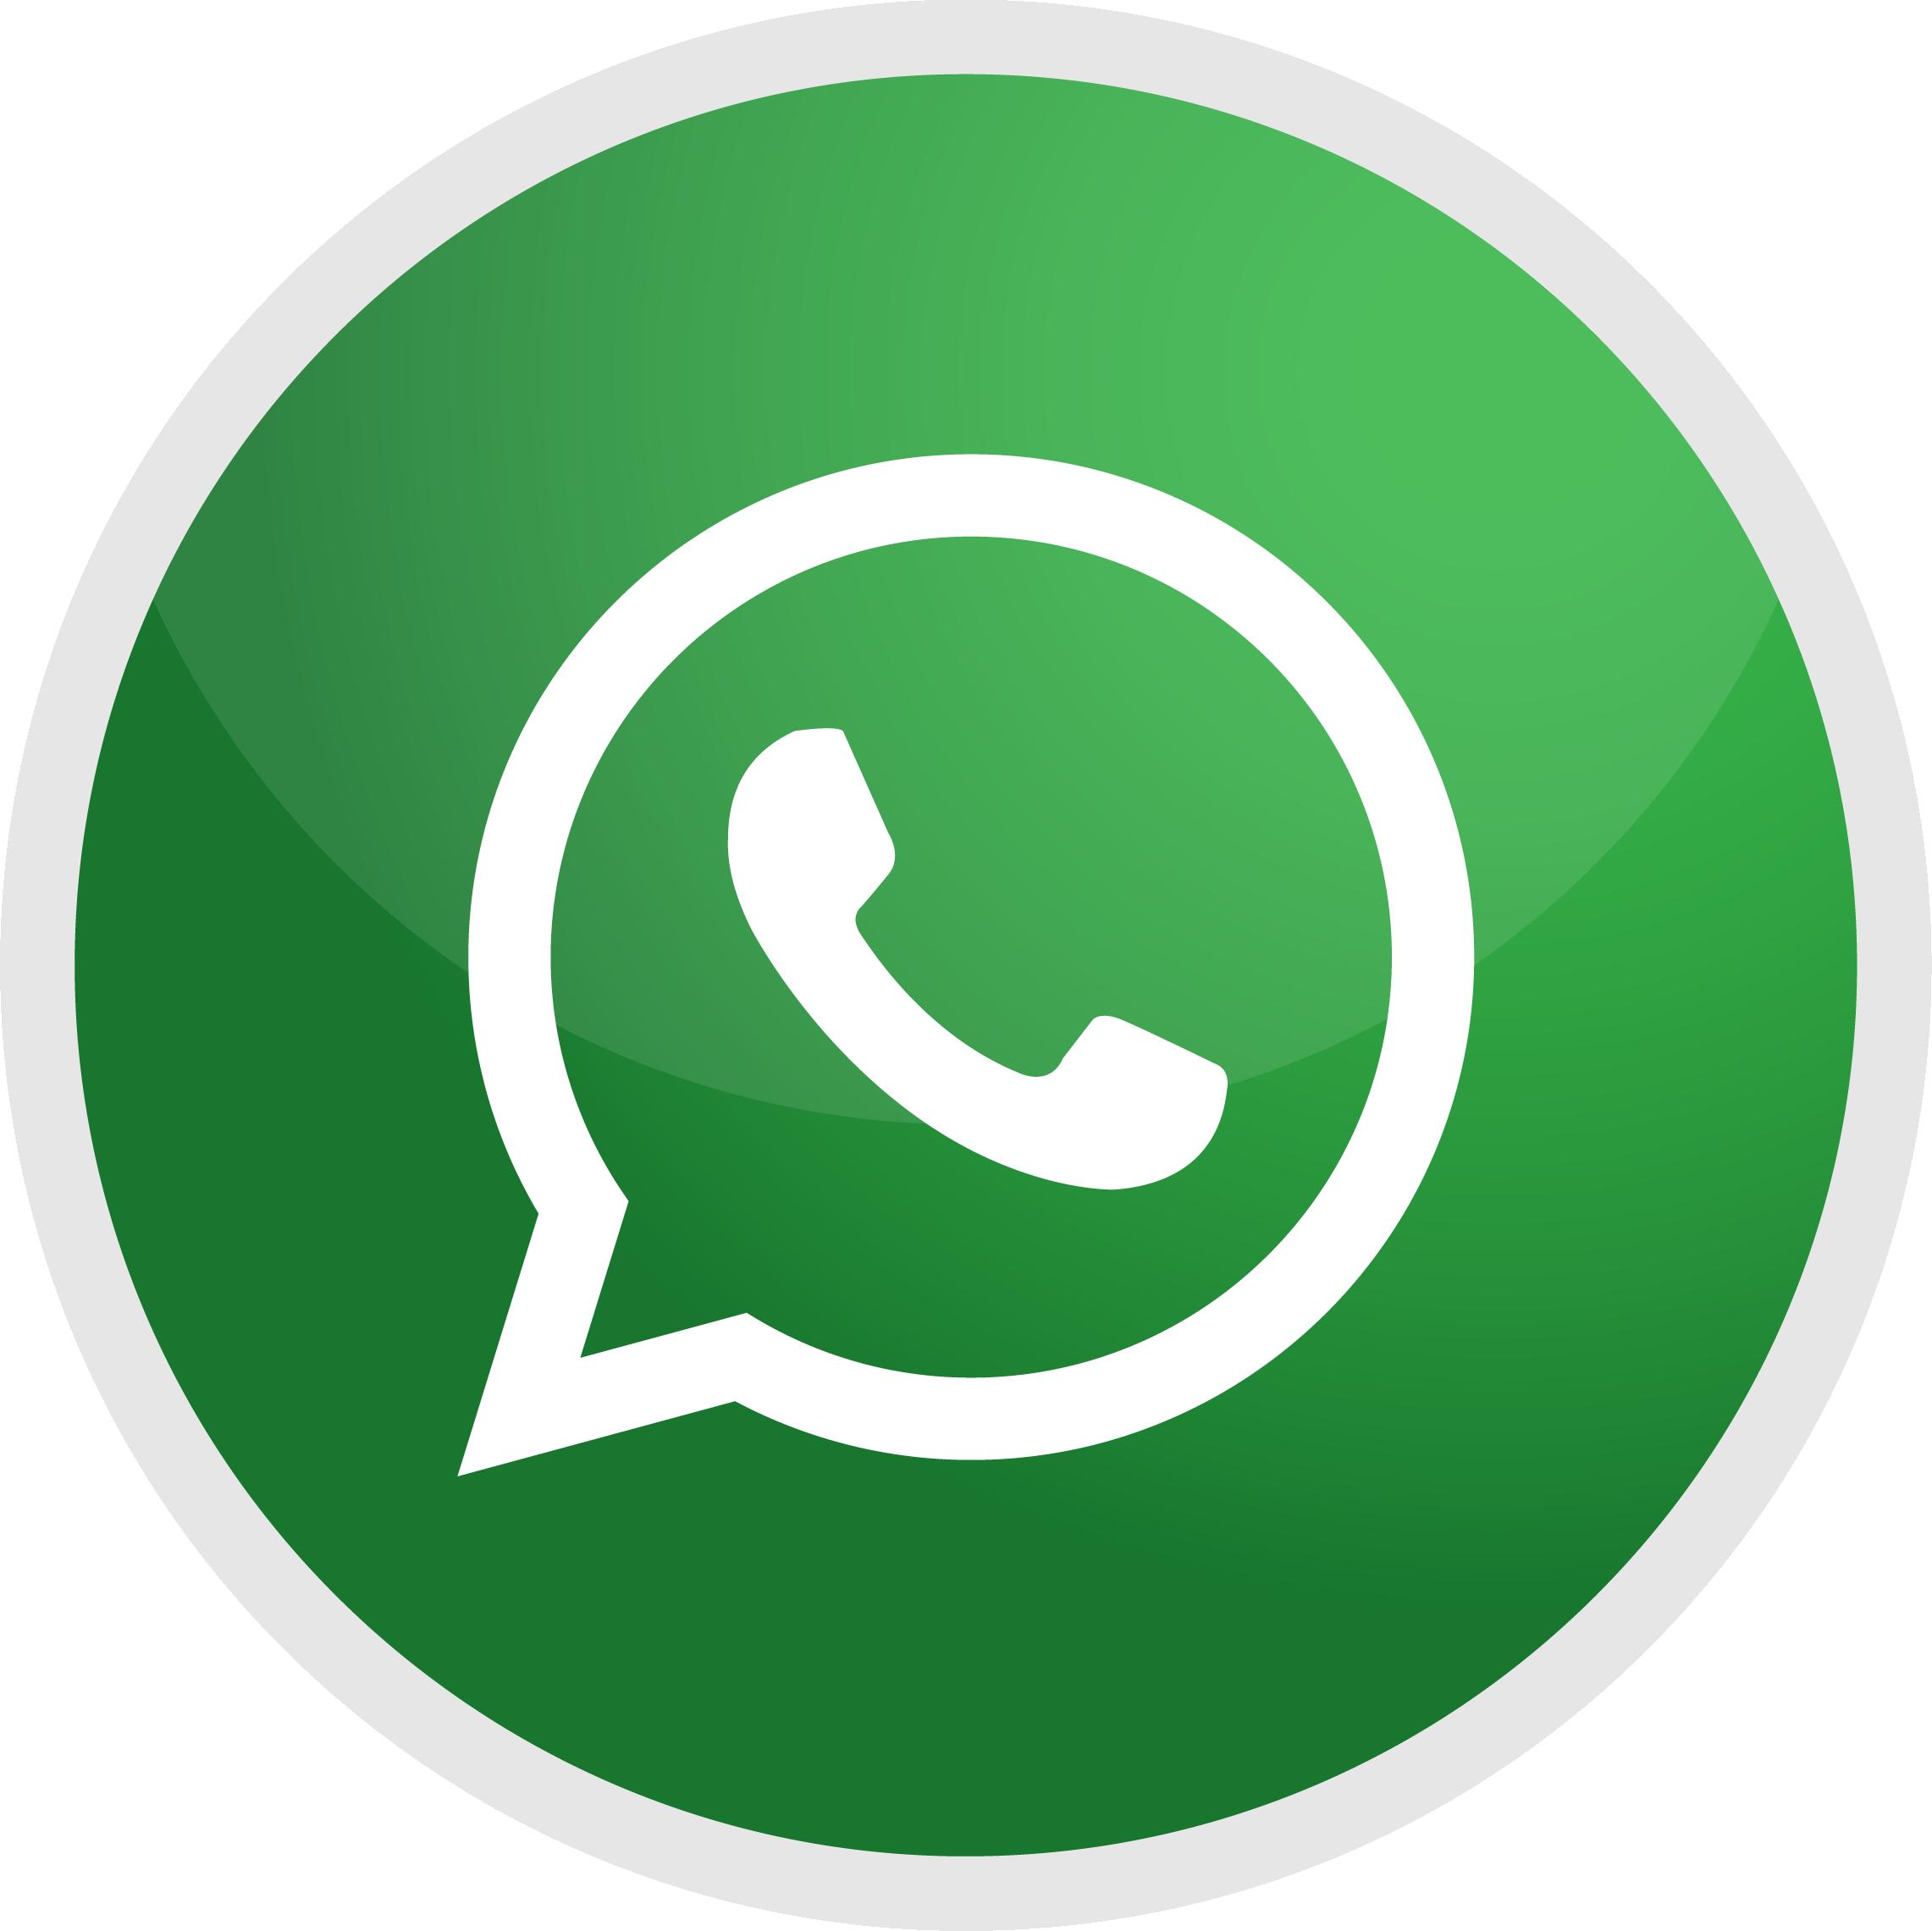 Communication clipart communication plan. Whatsapp png images a